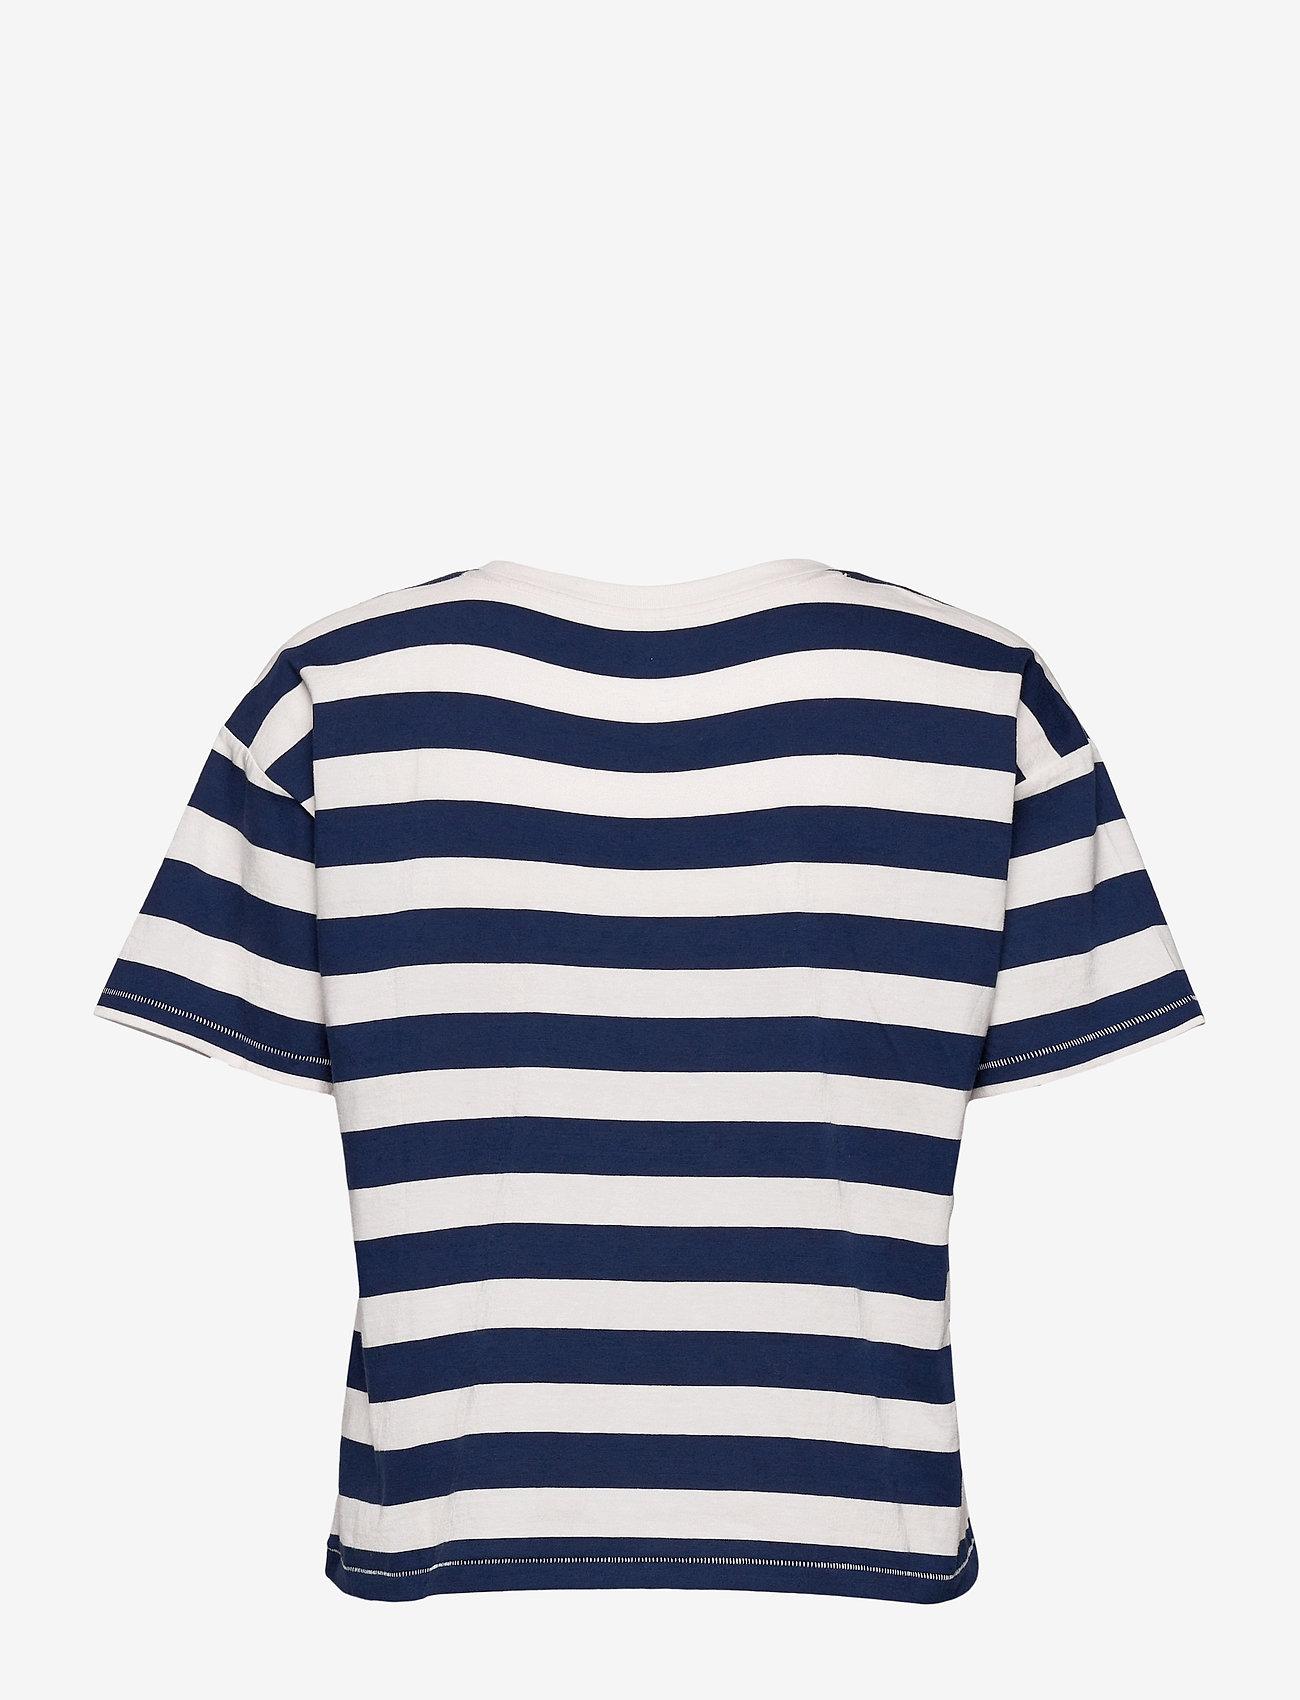 GAP - GAP EASY SS TEE - t-shirts - navy white stripe - 1